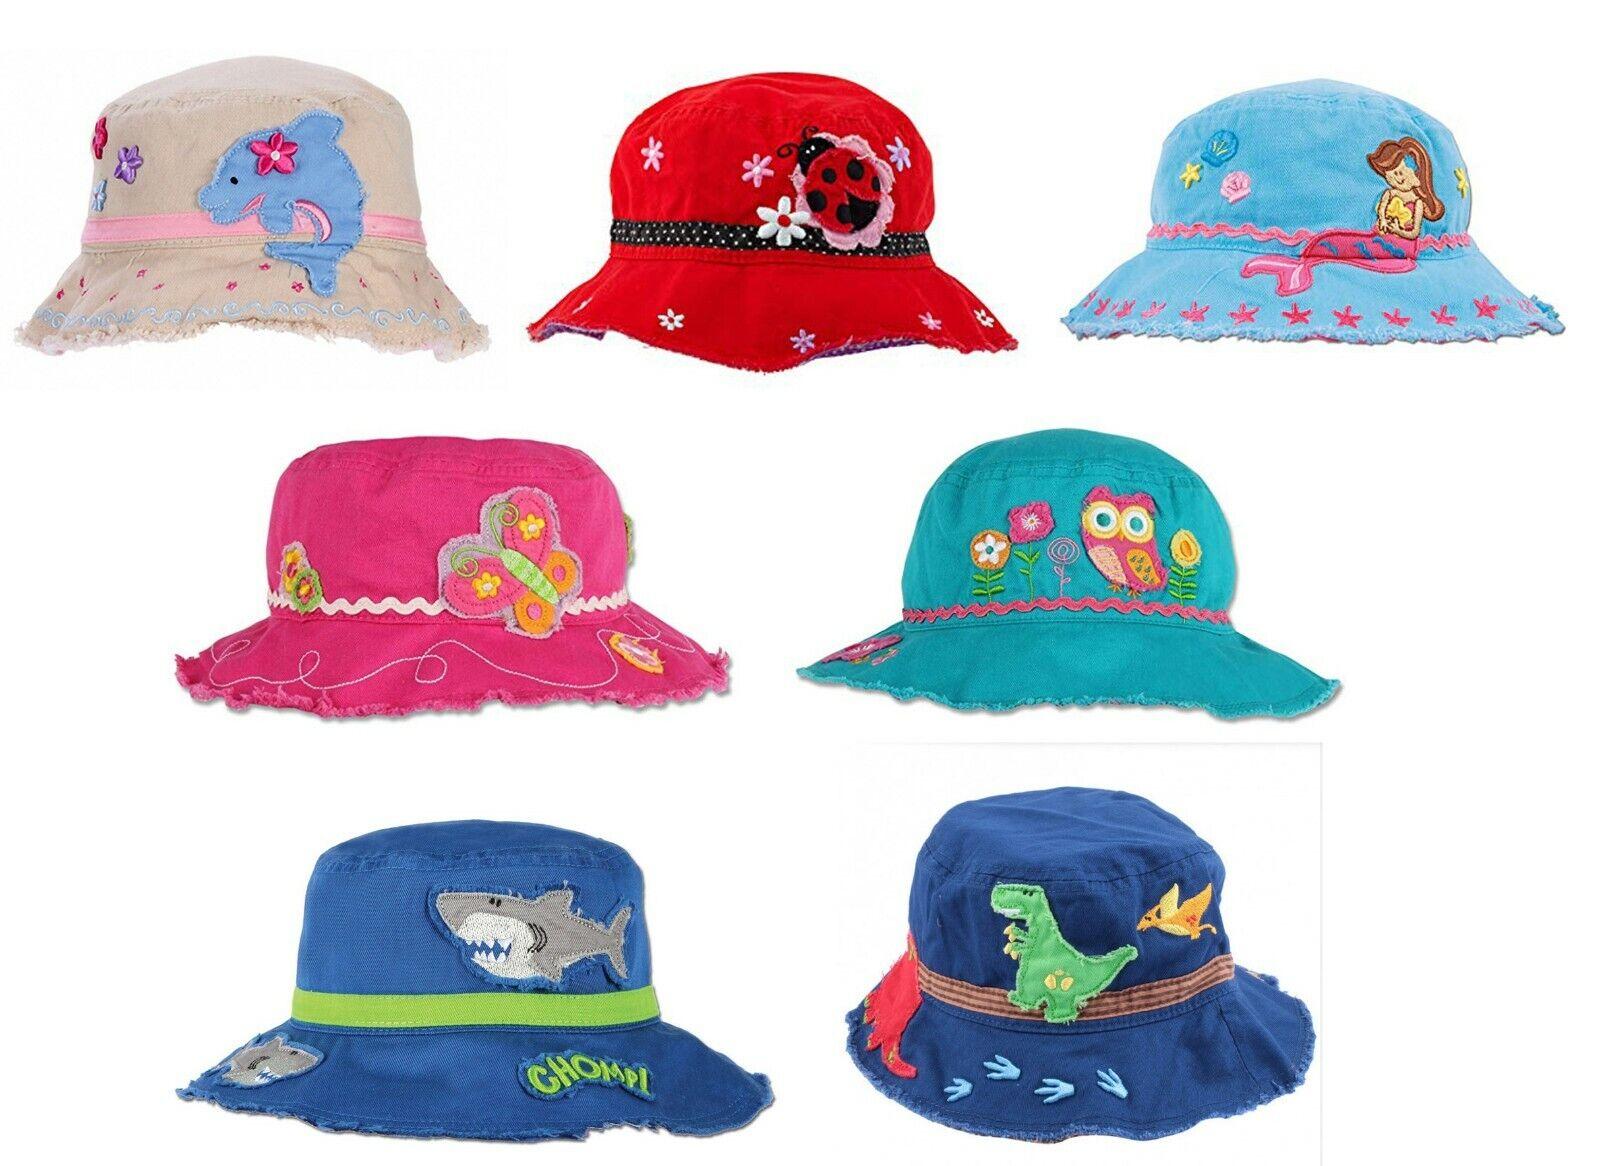 Kinder Sonnenhut, Stephen Joseph, Hai, Meerjungfrau, Delphin, Marienkäfer